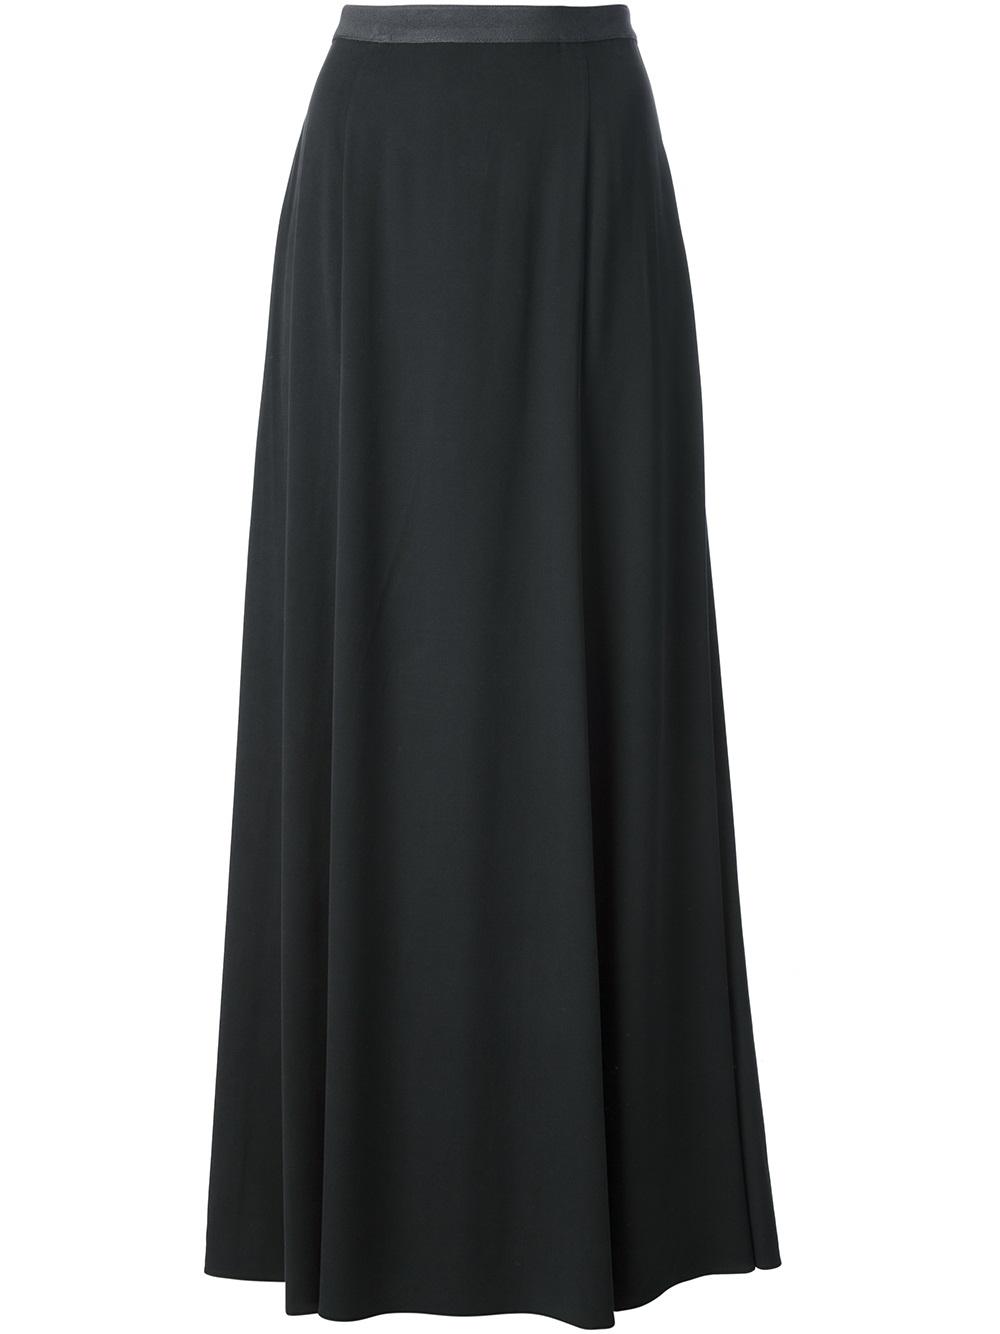 theyskens theory maxi skirt in gray grey lyst